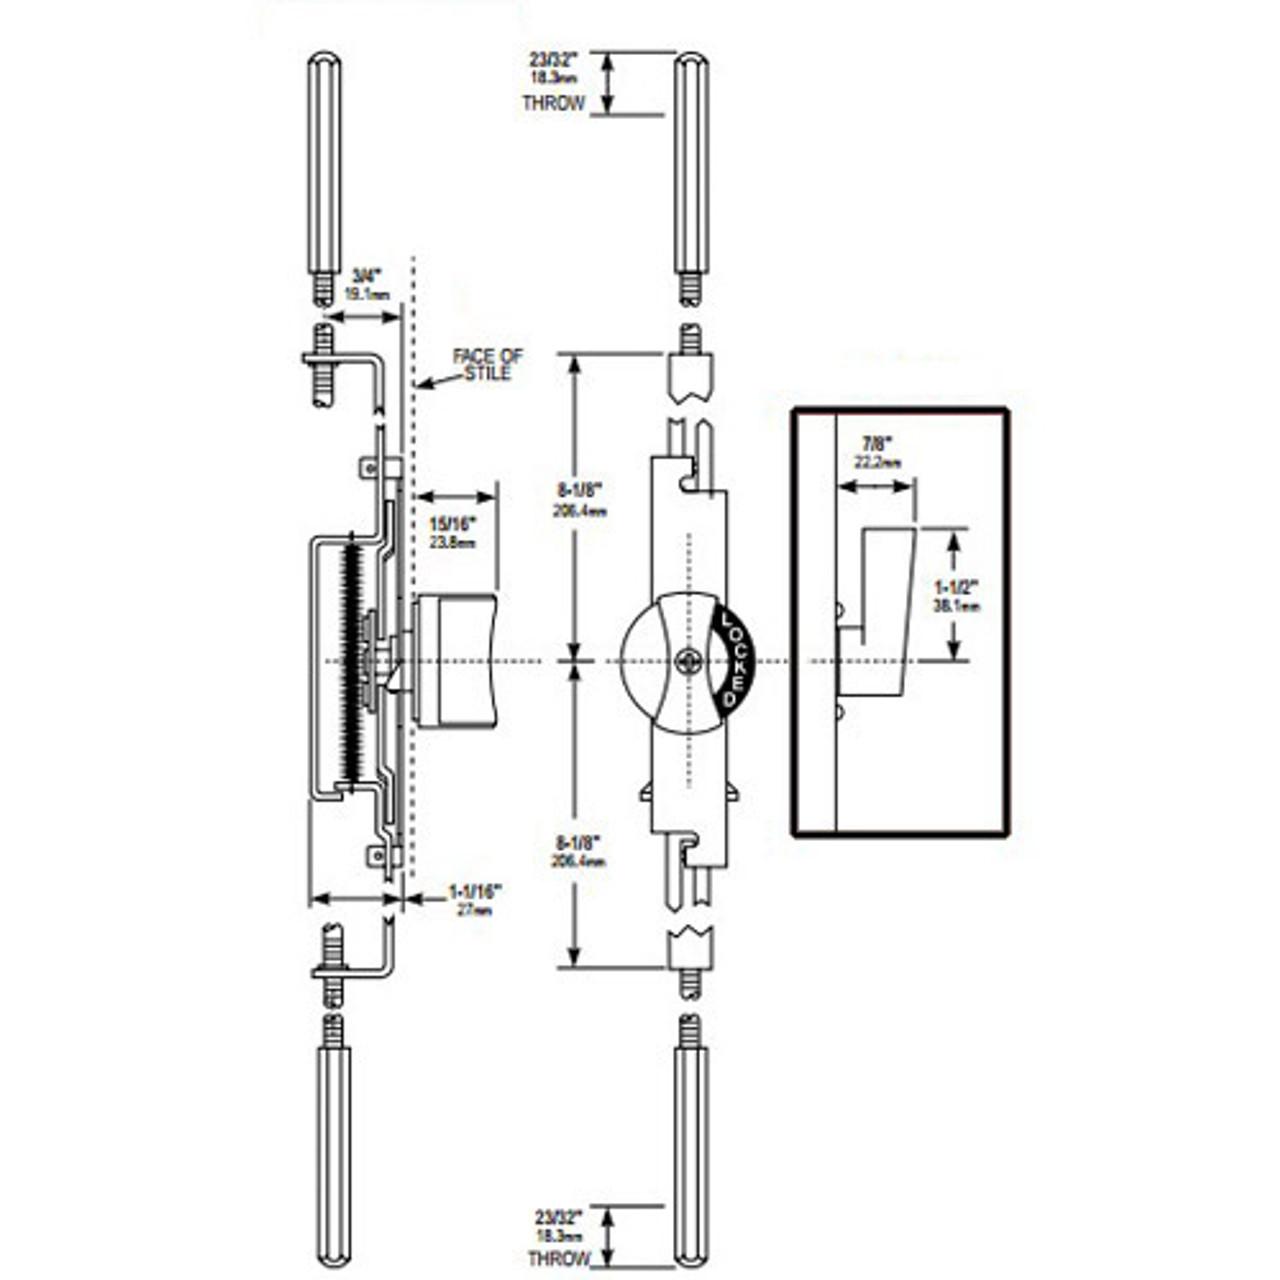 MS1881-04-121 Adams Rite Flushbolt Dimensional View